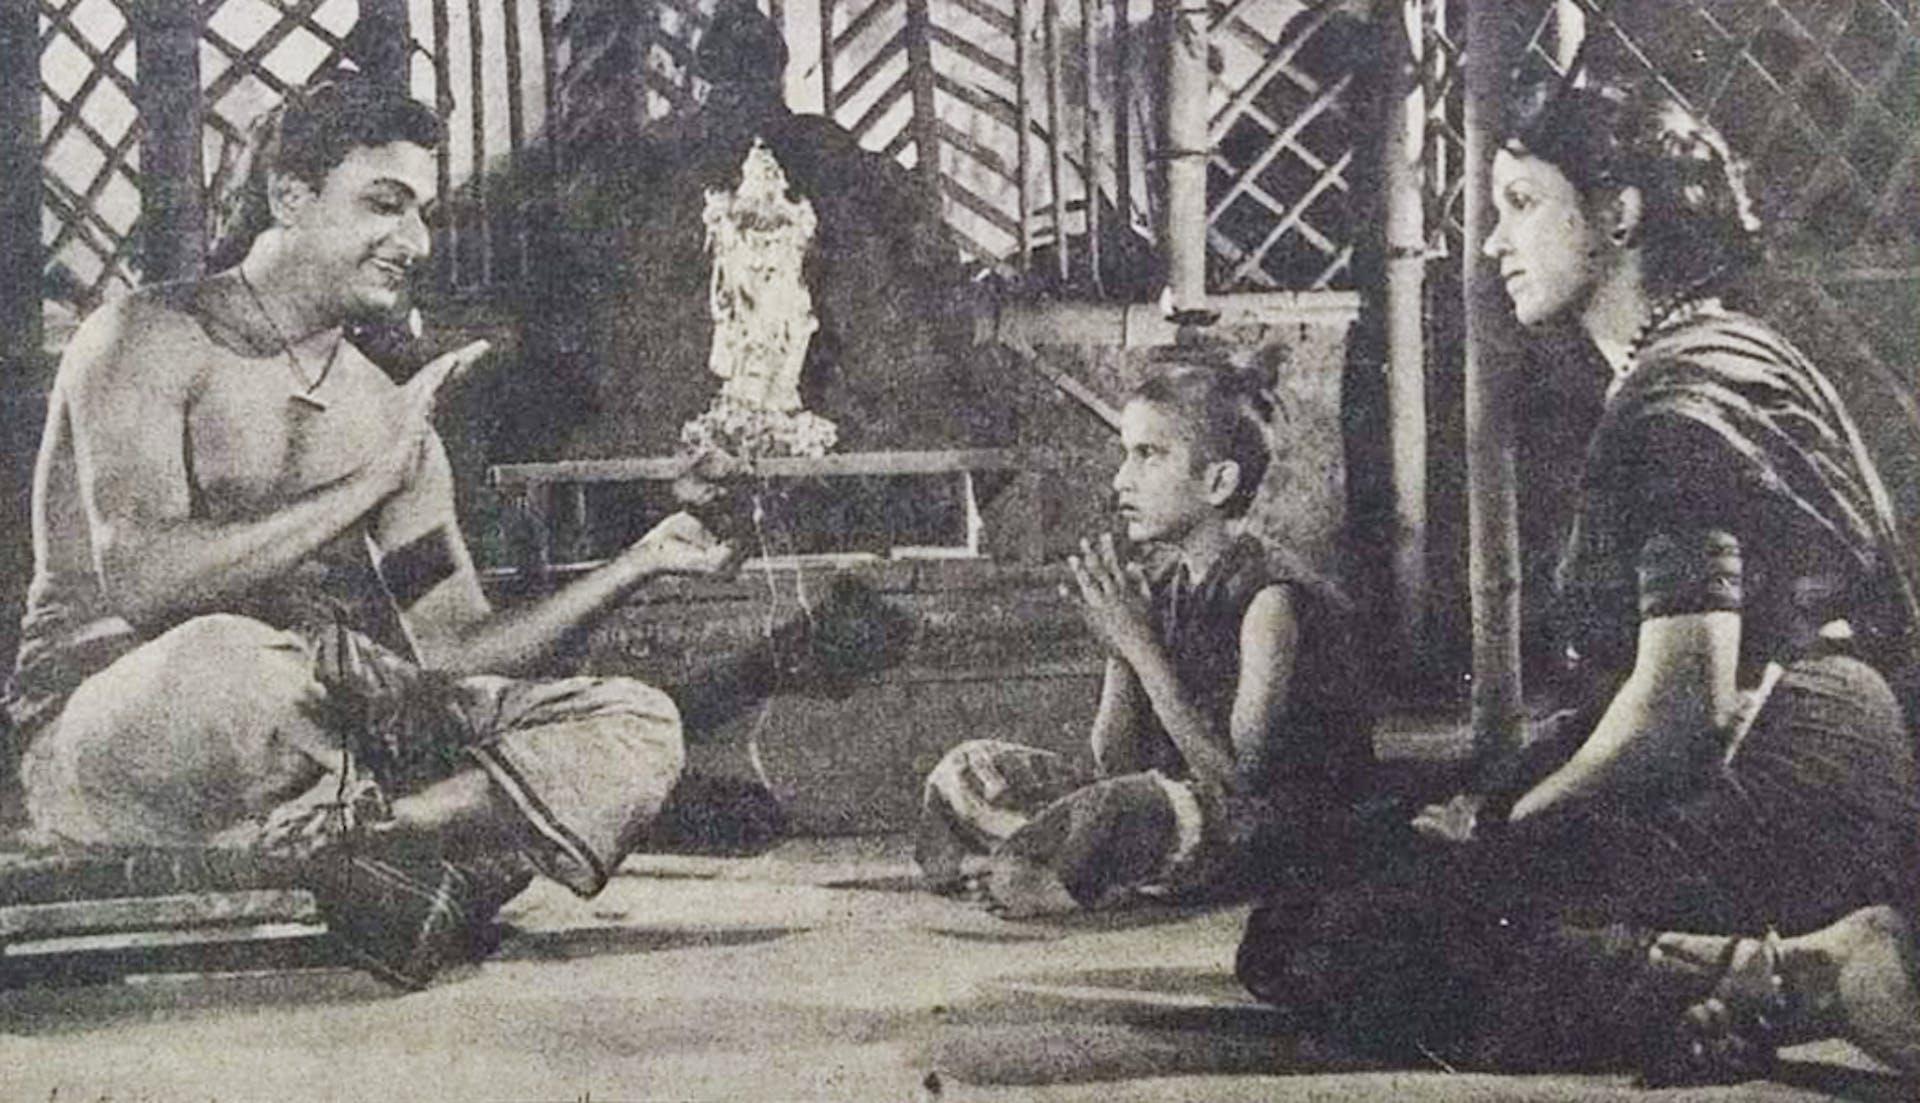 A still from the film Bhakta Cheta (1961) starring Dr. Rajkumar, Pratima Devi and S.V. Rajendra Singh (the child actor here). Photograph by MRK Murthy